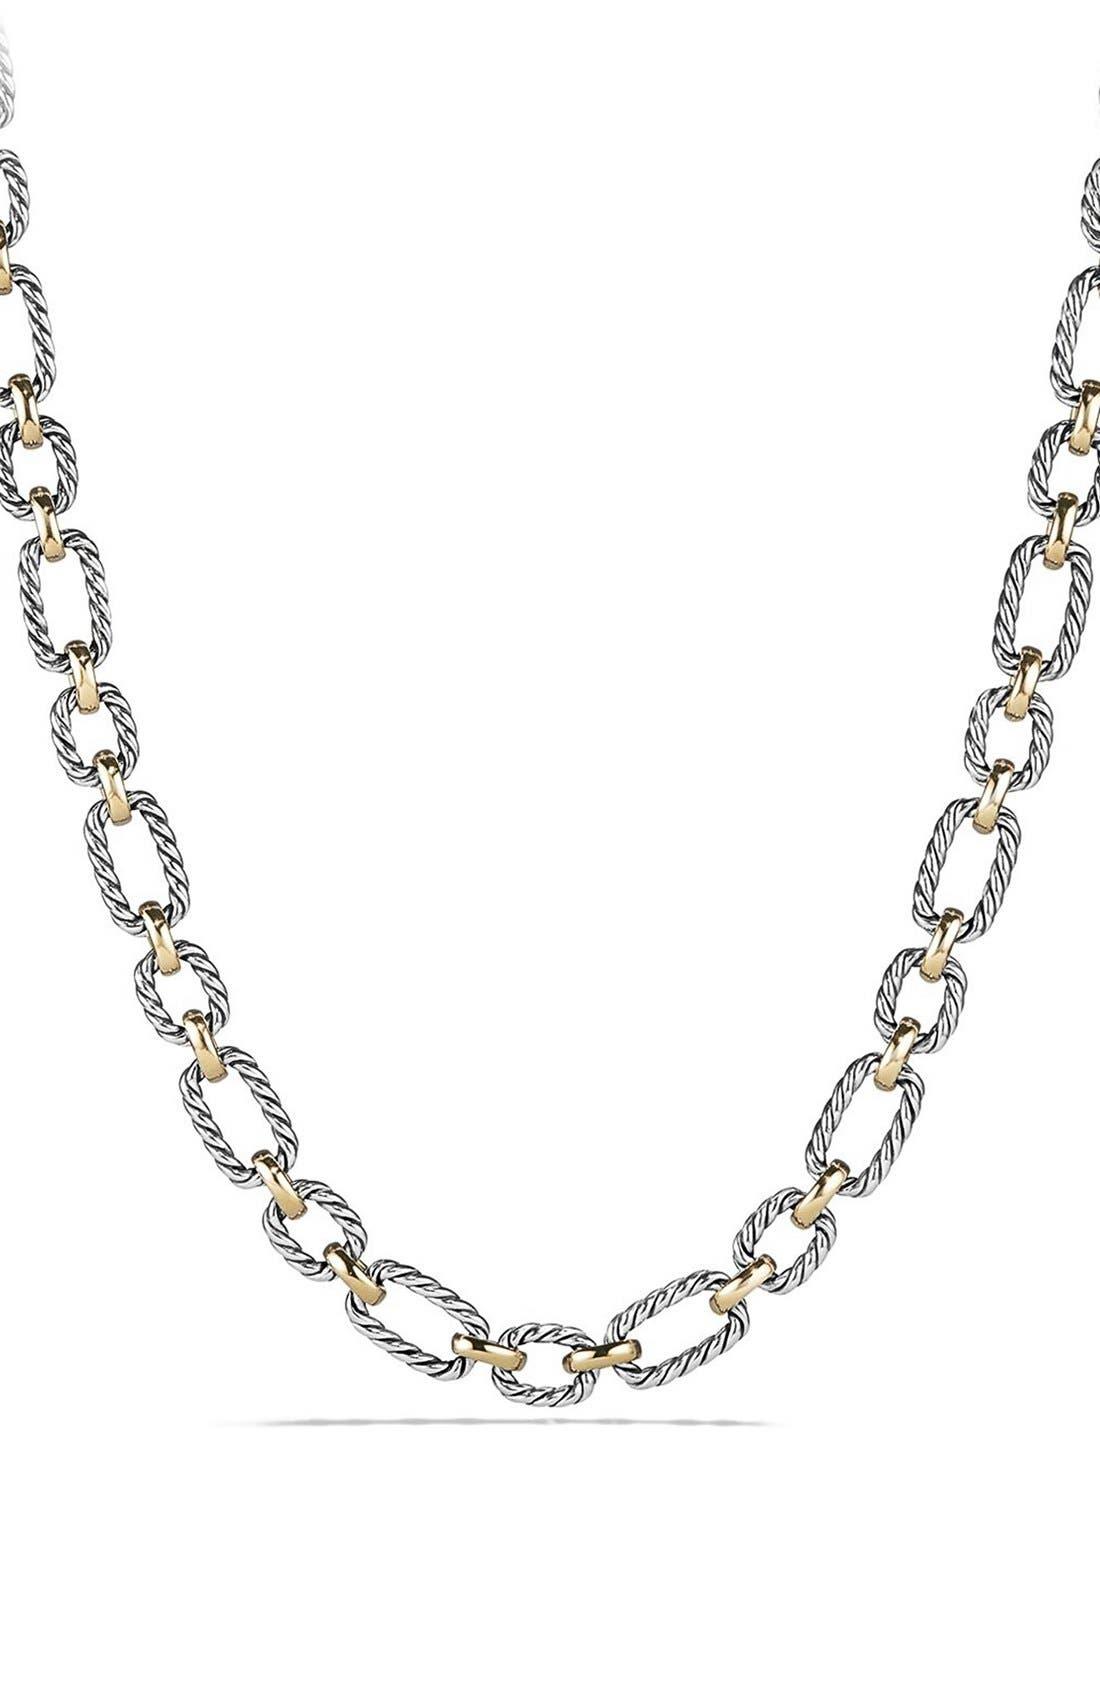 Main Image - David Yurman 'Chain' Cushion Link Necklace with Sapphires & 18K Gold